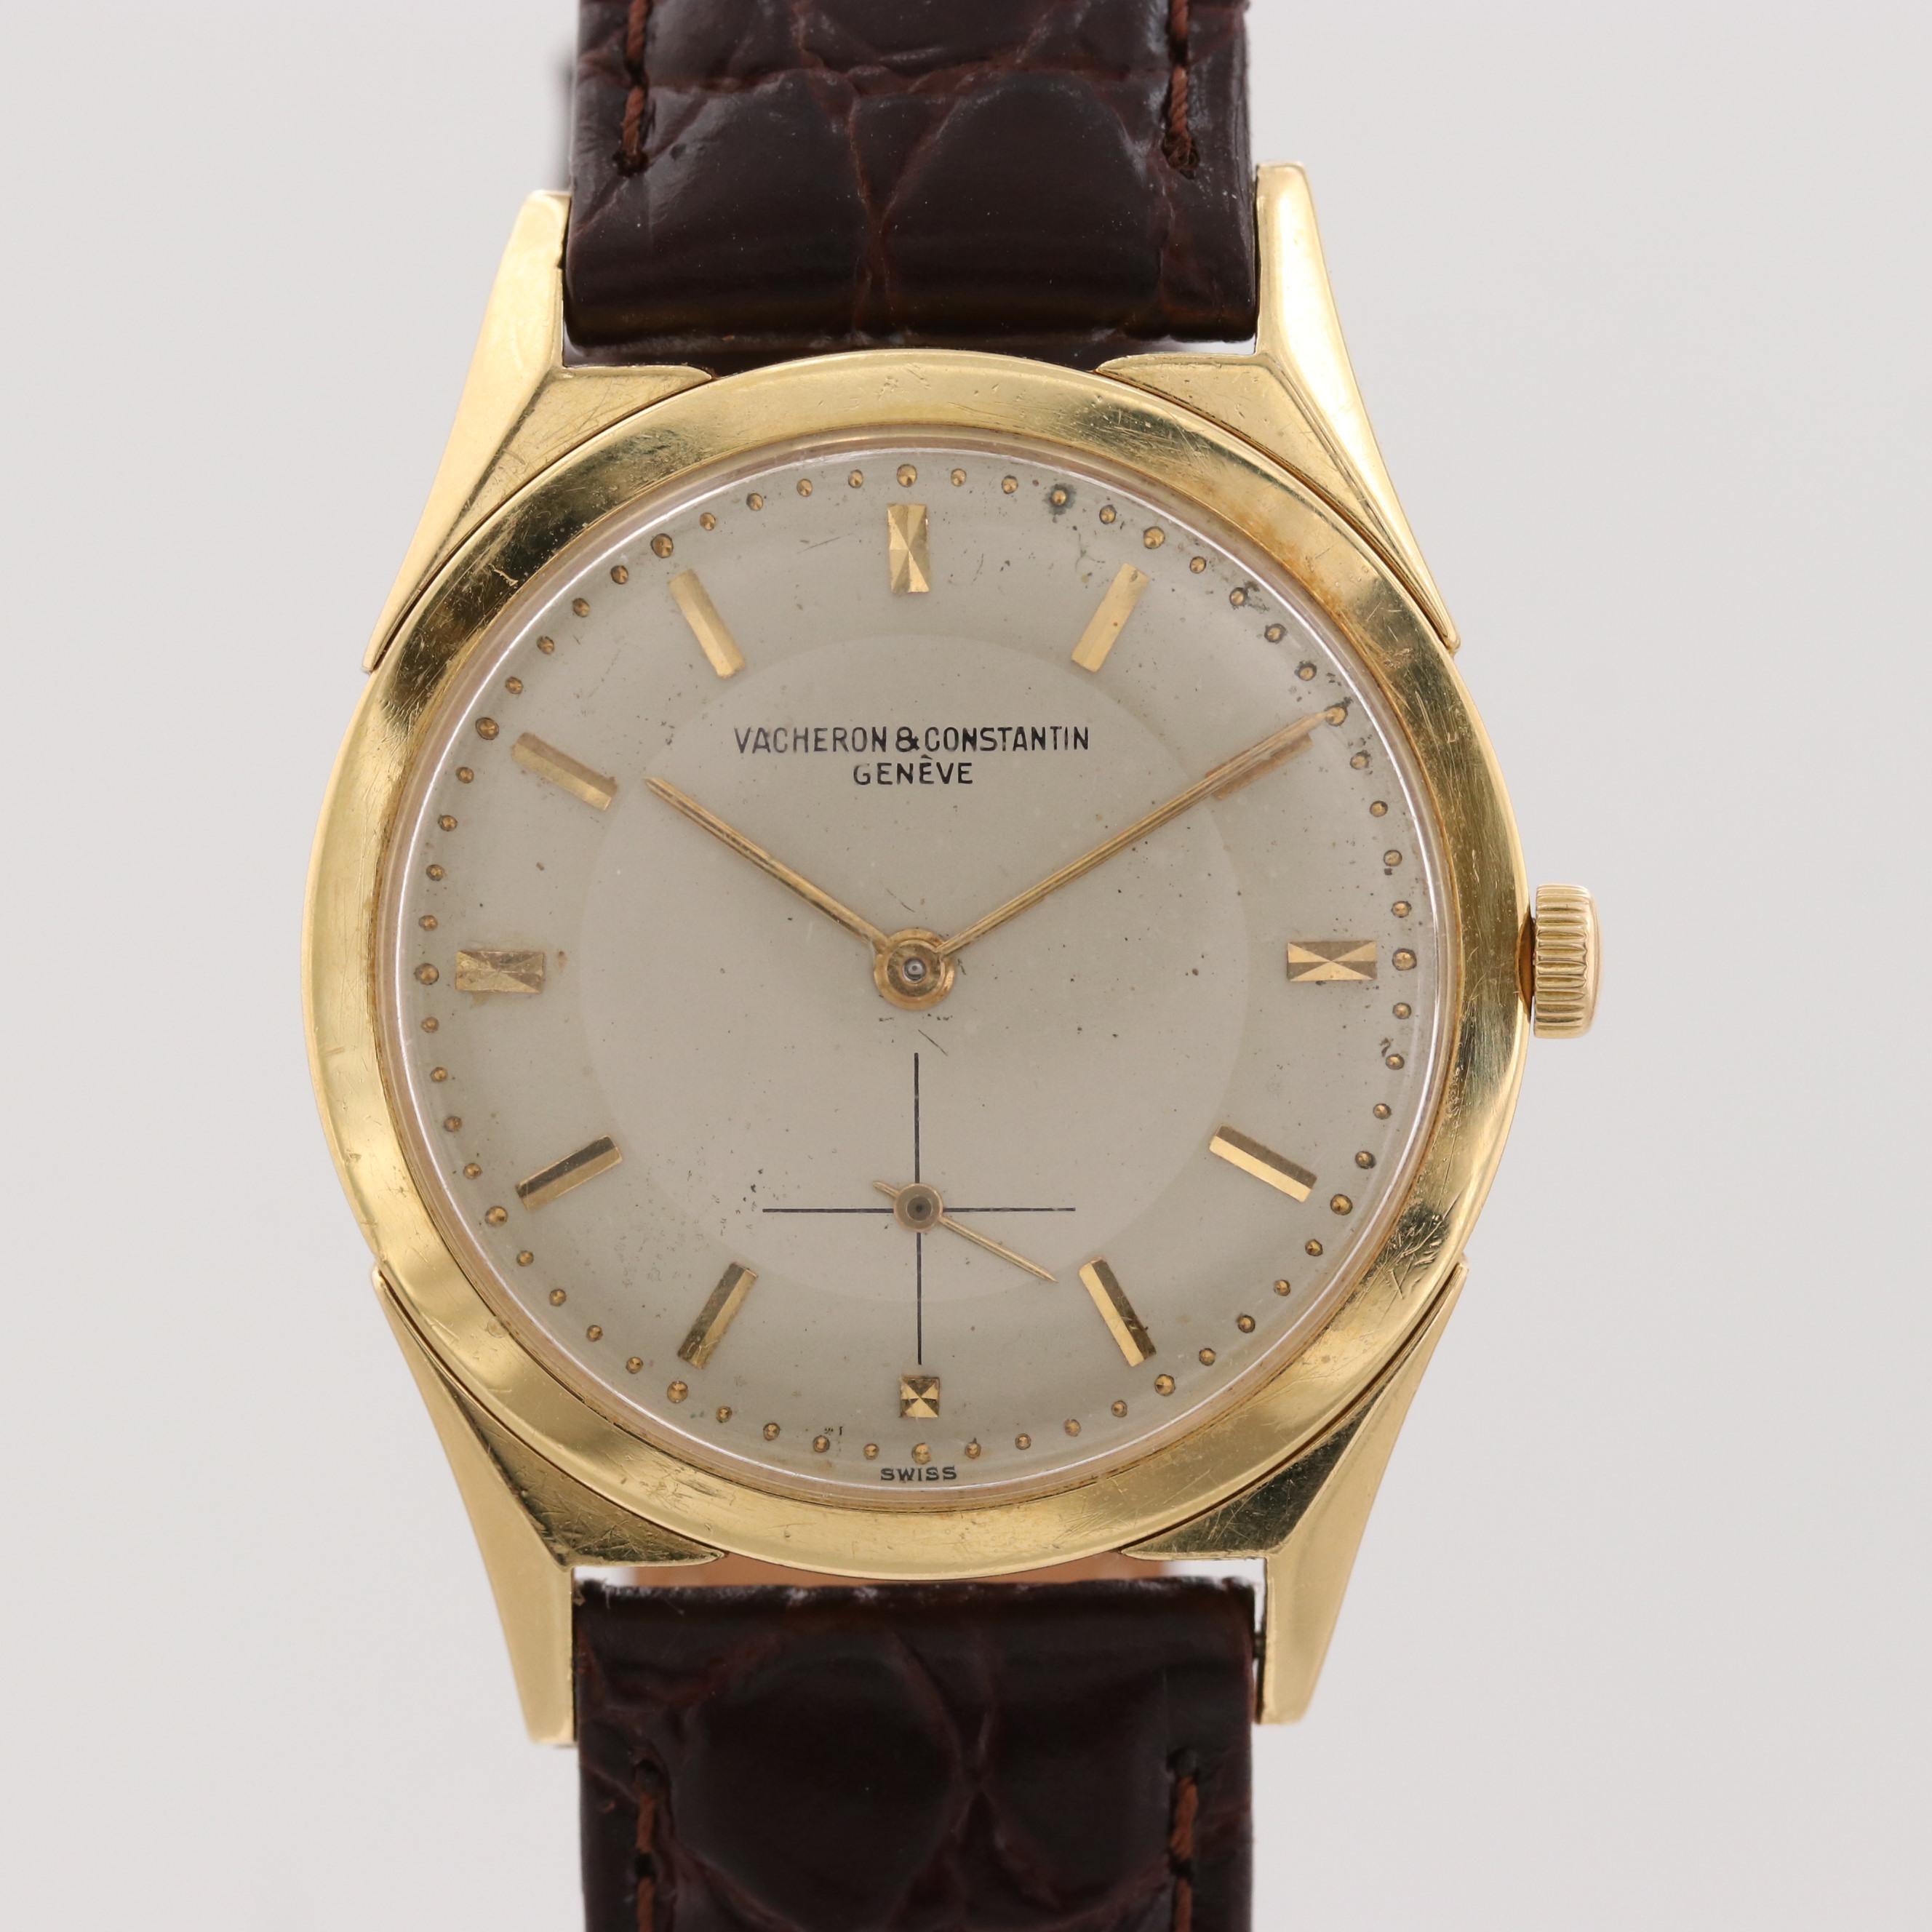 Vintage Vacheron & Constantin 6068 18K Yellow Gold Stem Wind Wristwatch